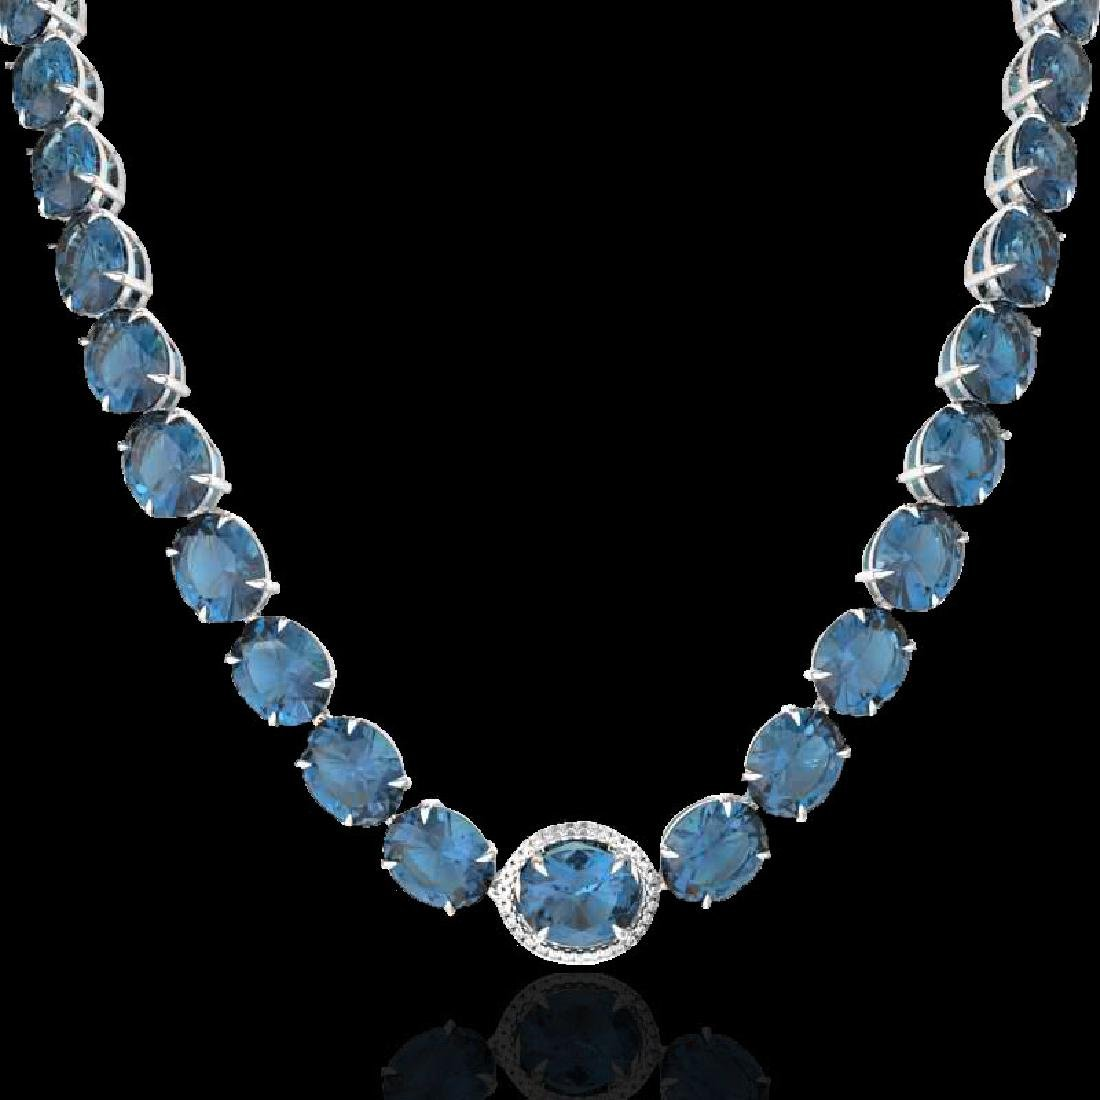 177 CTW London Blue Topaz & VS/SI Diamond Halo Micro - 2